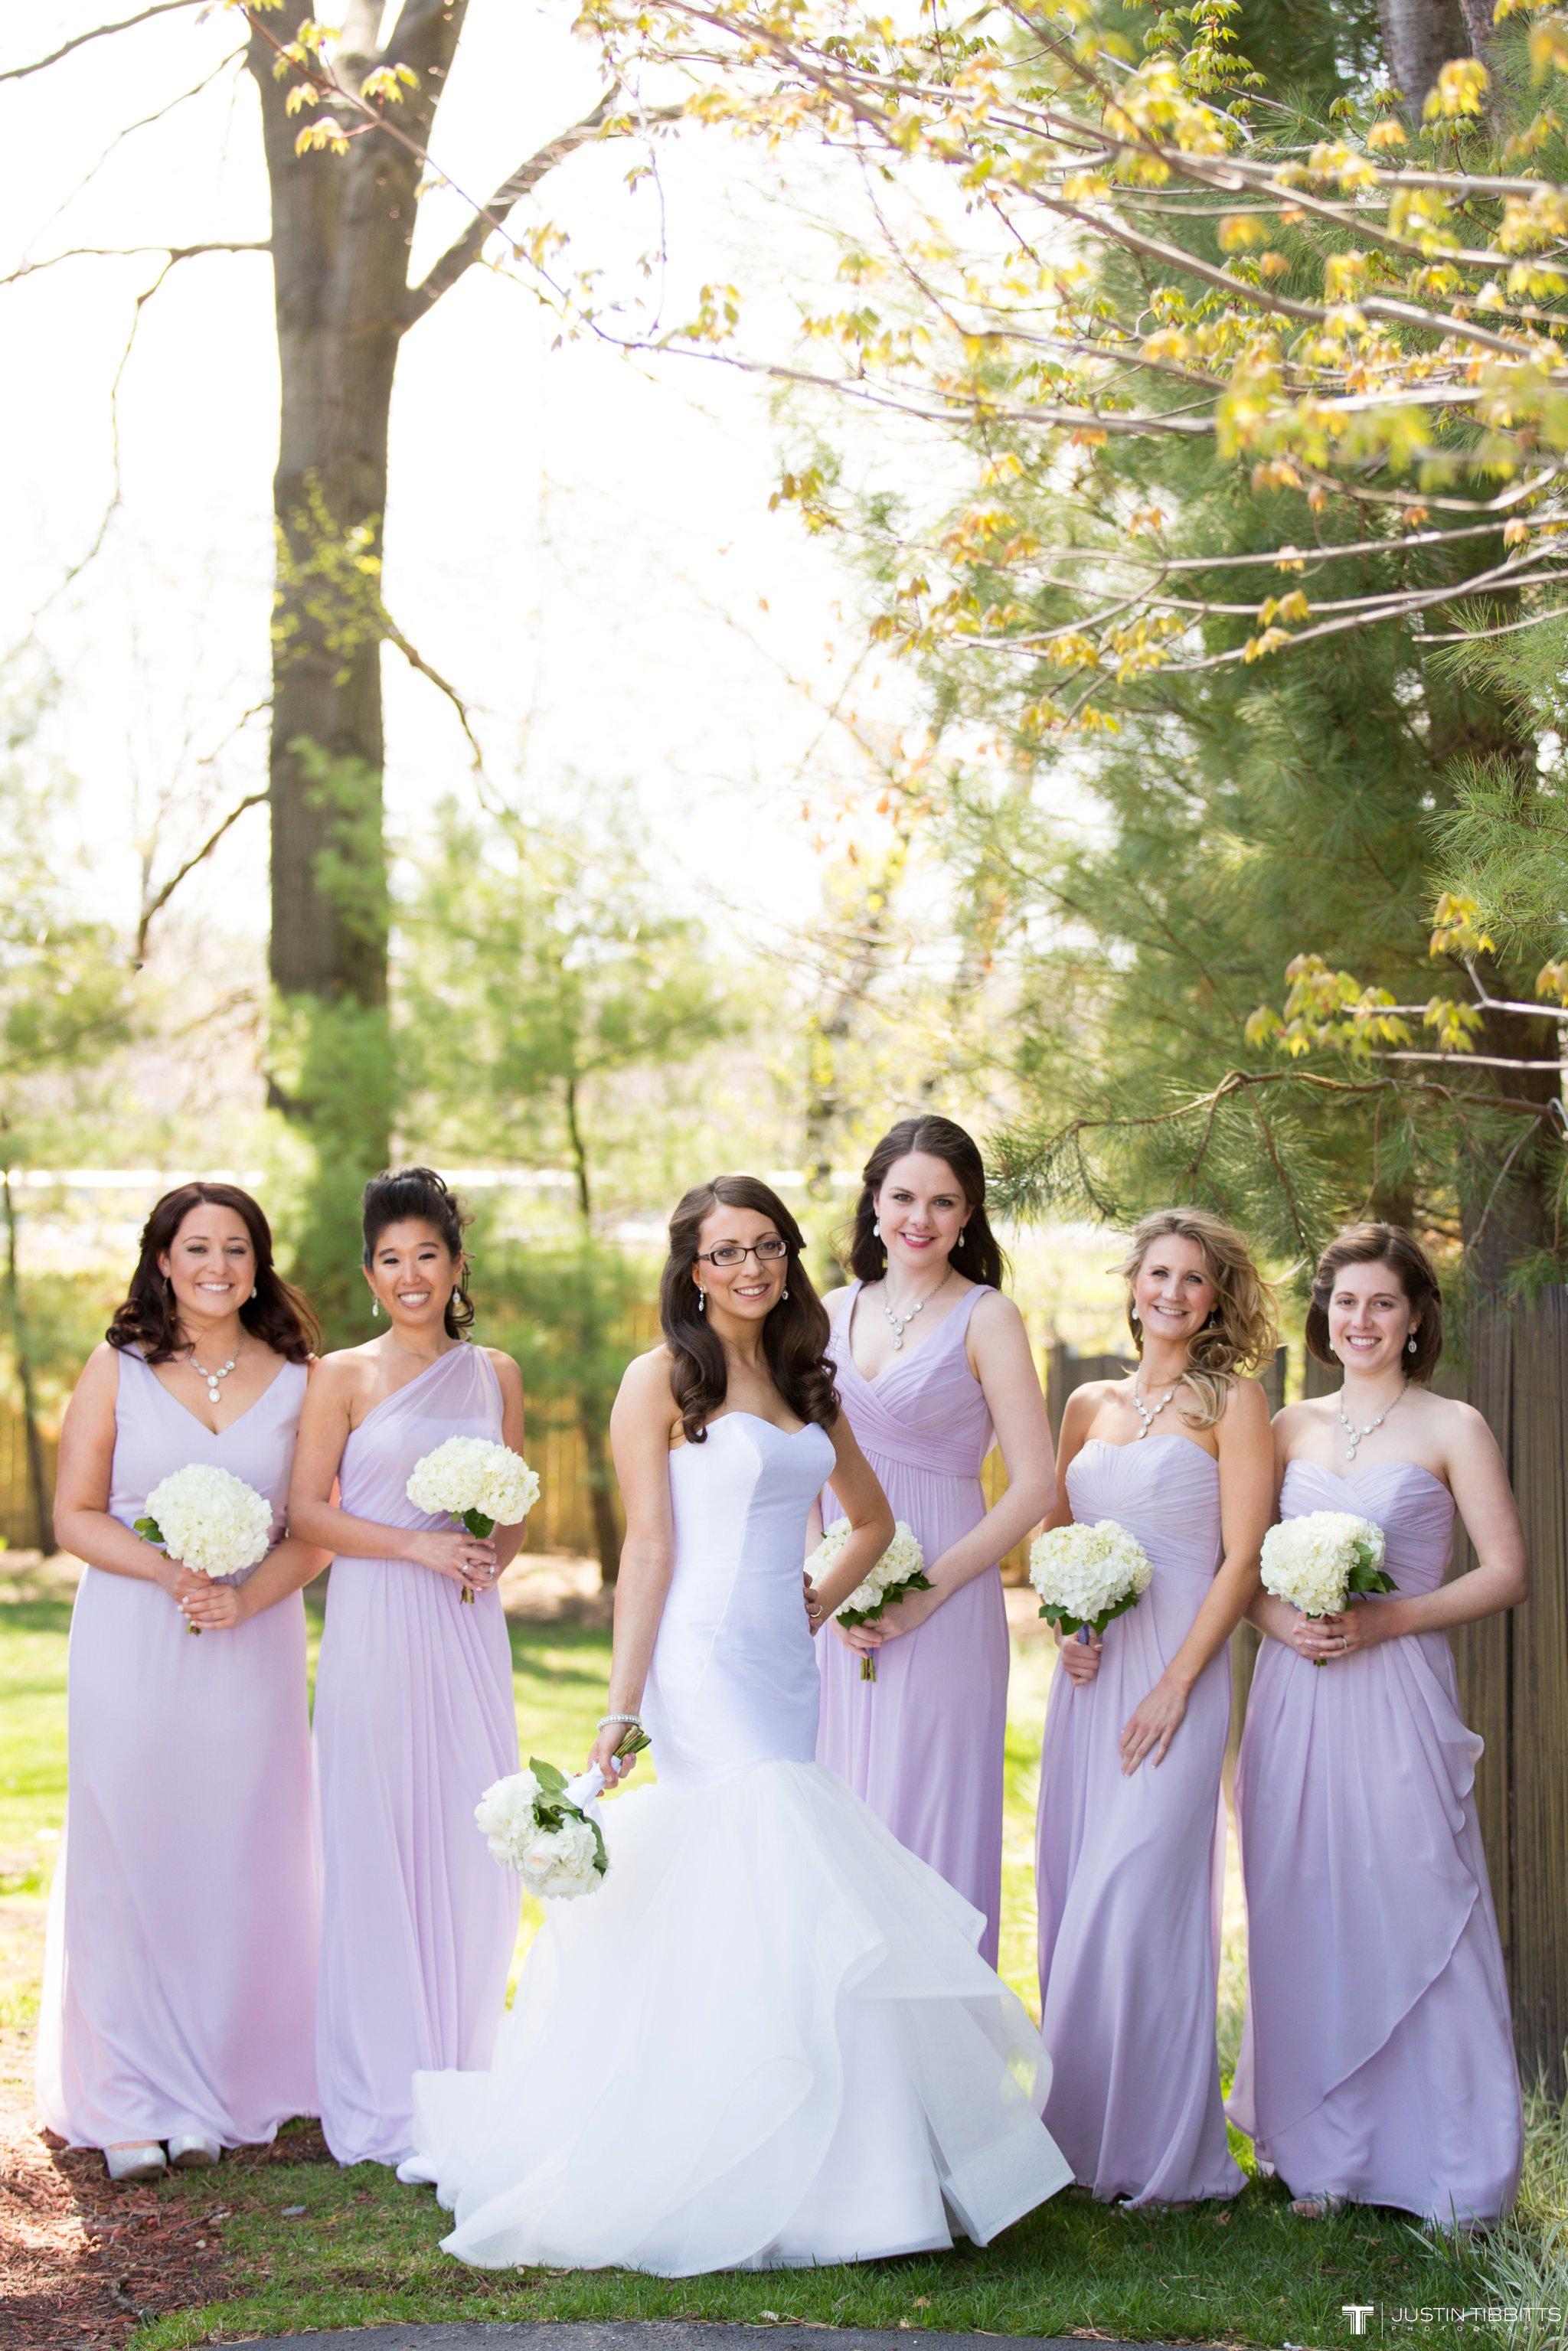 Antonia and Nicks Key Hall at Proctors Wedding Photos_0049